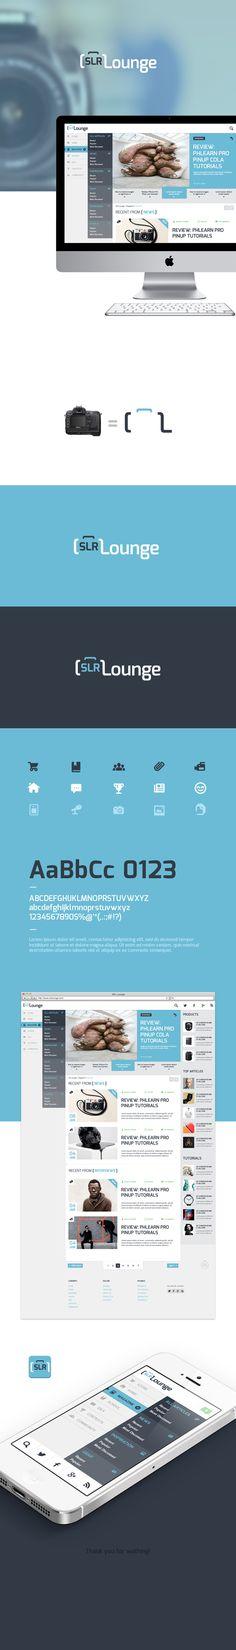 http://behance.vo.llnwd.net/profiles10/615712/projects/10021283/c00087262bf22a6333d2cd479ab5d3f0.jpg #design